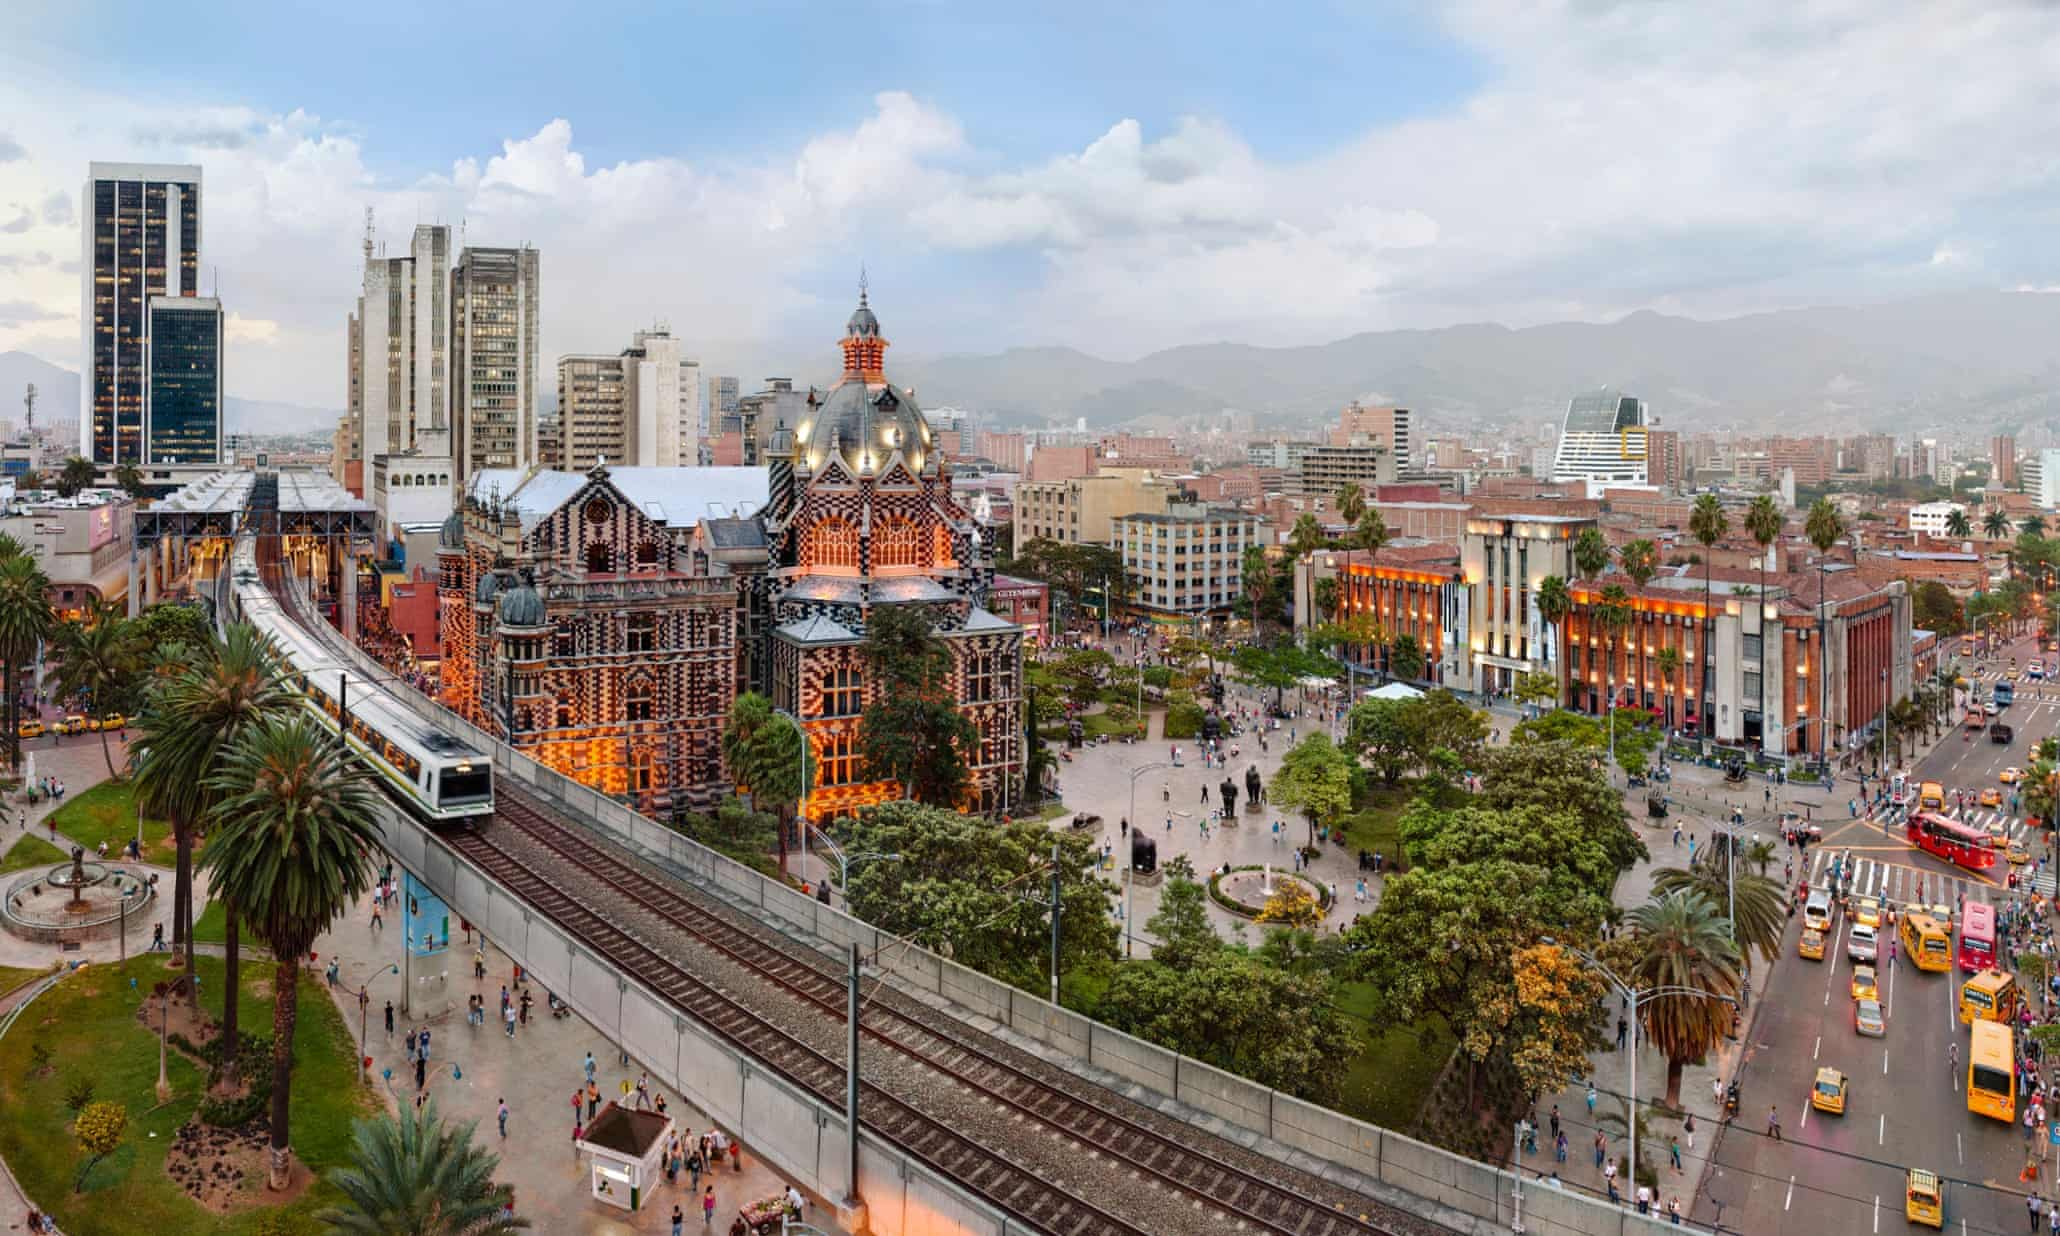 6 of the Best Rooftop Bars in Medellín